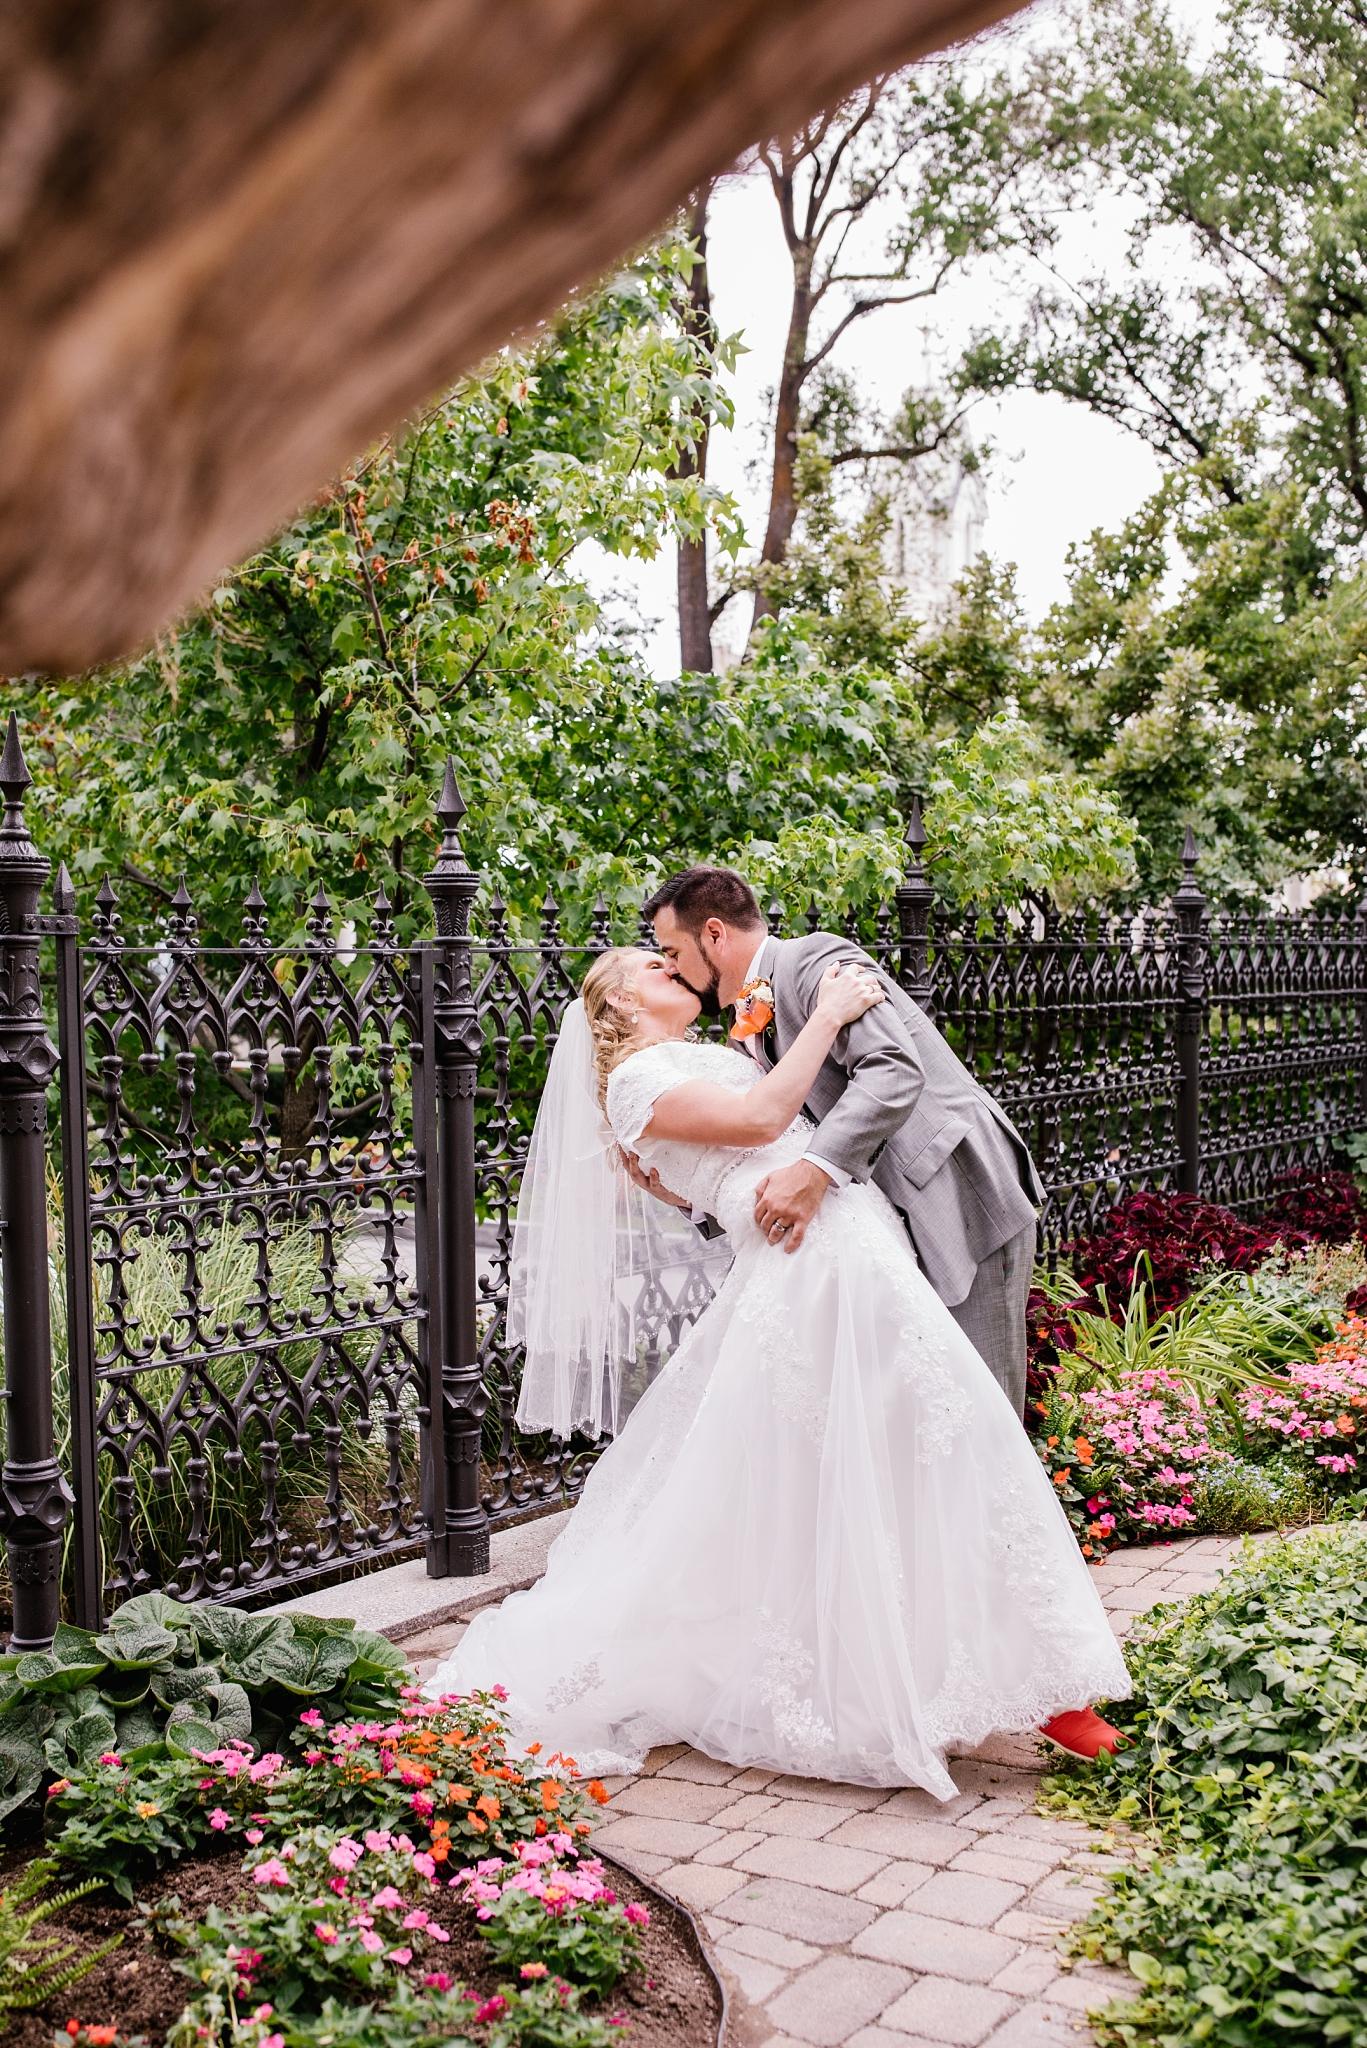 Justin and Melissa-157_Lizzie-B-Imagery-Utah-Wedding-Photographer-Salt-Lake-City-Temple-Photographer-Lion-House-Luncheon-The-Grand-Ballroom-Bountiful.jpg